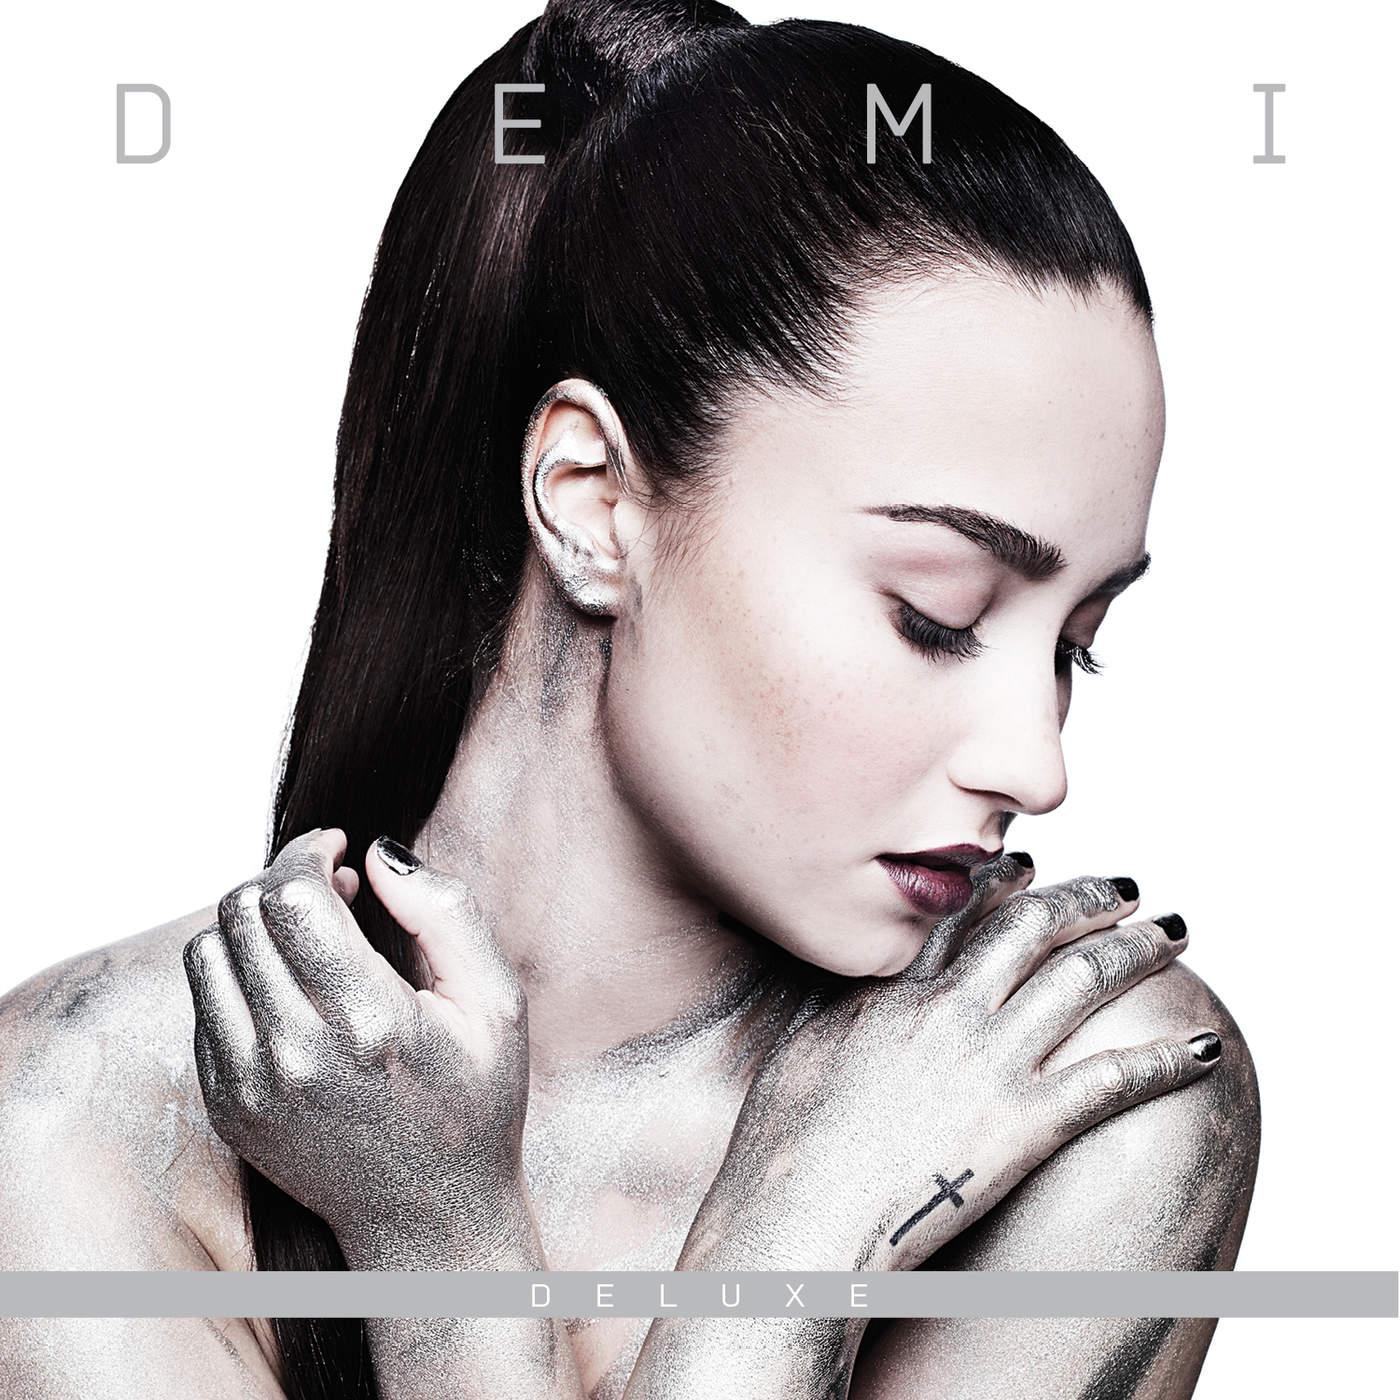 Demi (Deluxe) (iTunes Plus AAC M4A) (Album